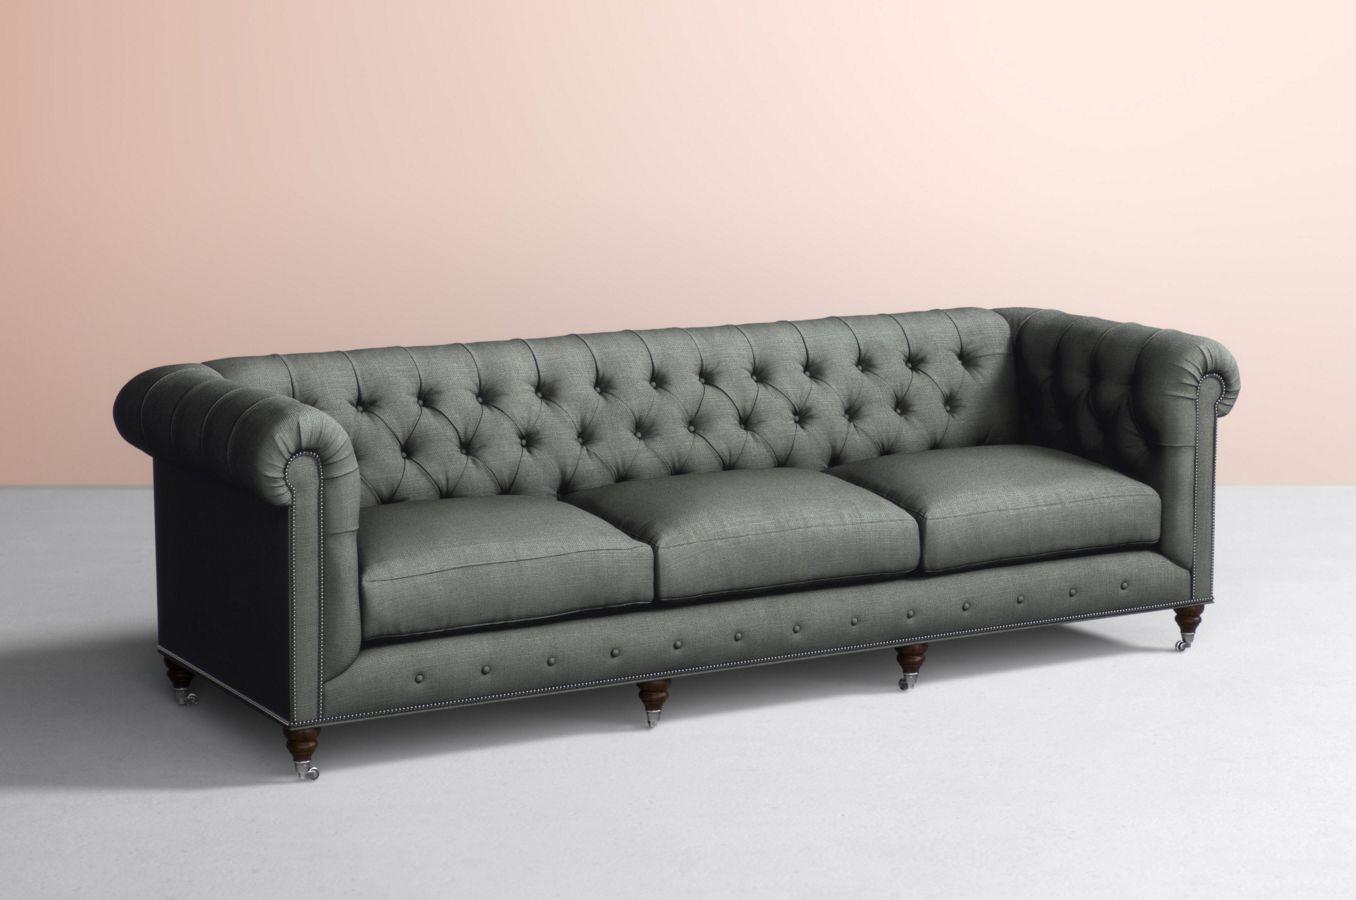 Lyre Chesterfield Three Cushion Sofa